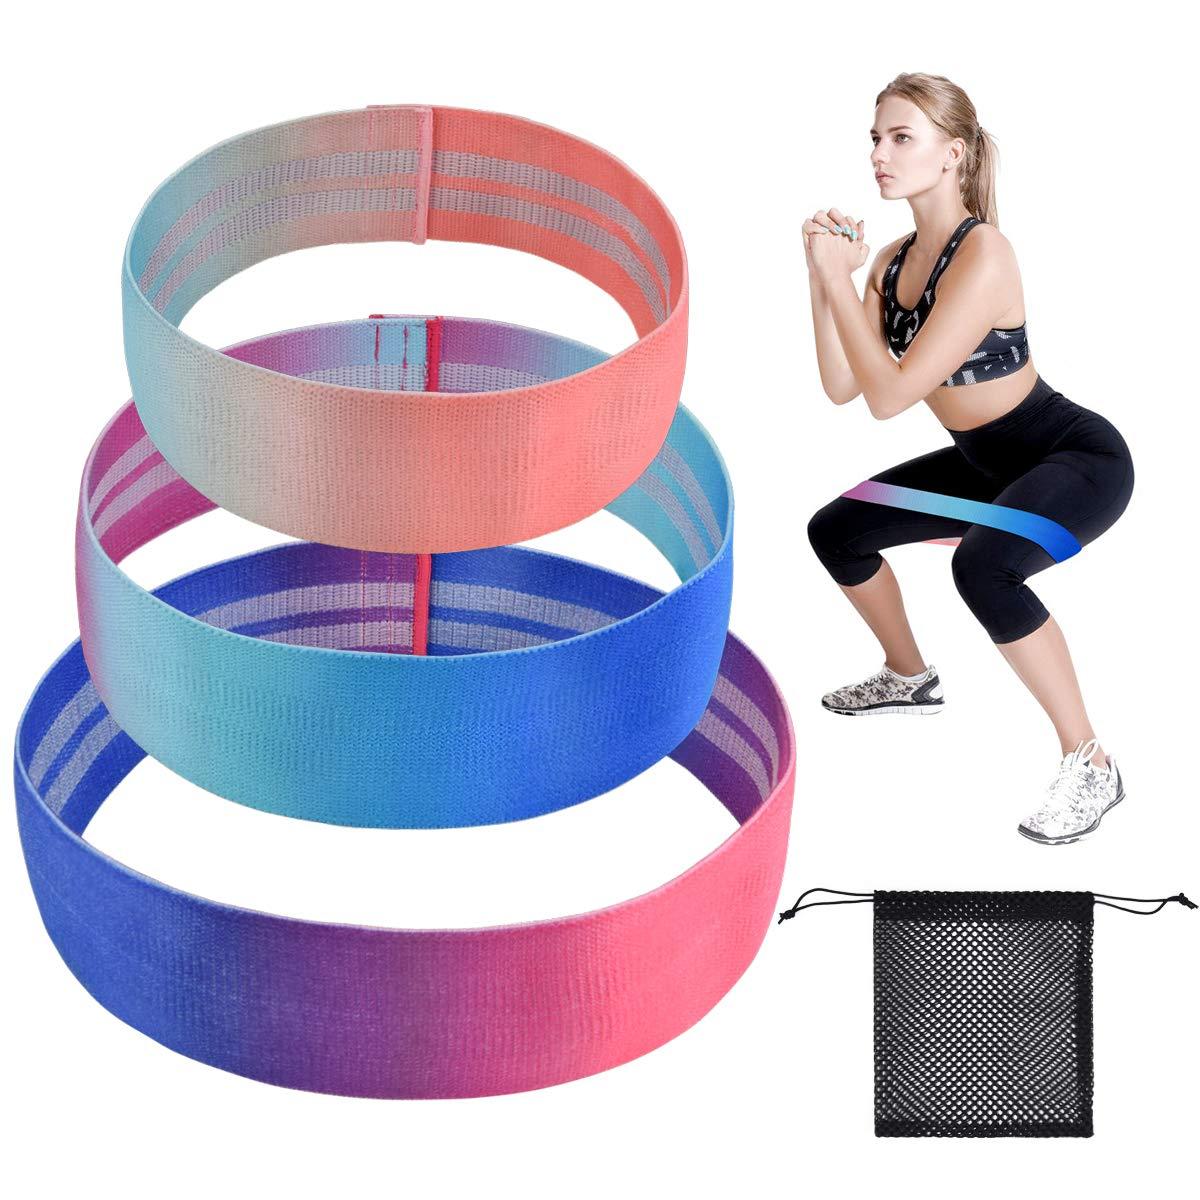 ActiveVikings Fitnessb/änder Set 3-St/ärken Fitnessband Gymnastikband Widerstandsband 1.20 m L/änge Ideal f/ür Muskelaufbau Physiotherapie Pilates Yoga Gymnastik und Crossfit